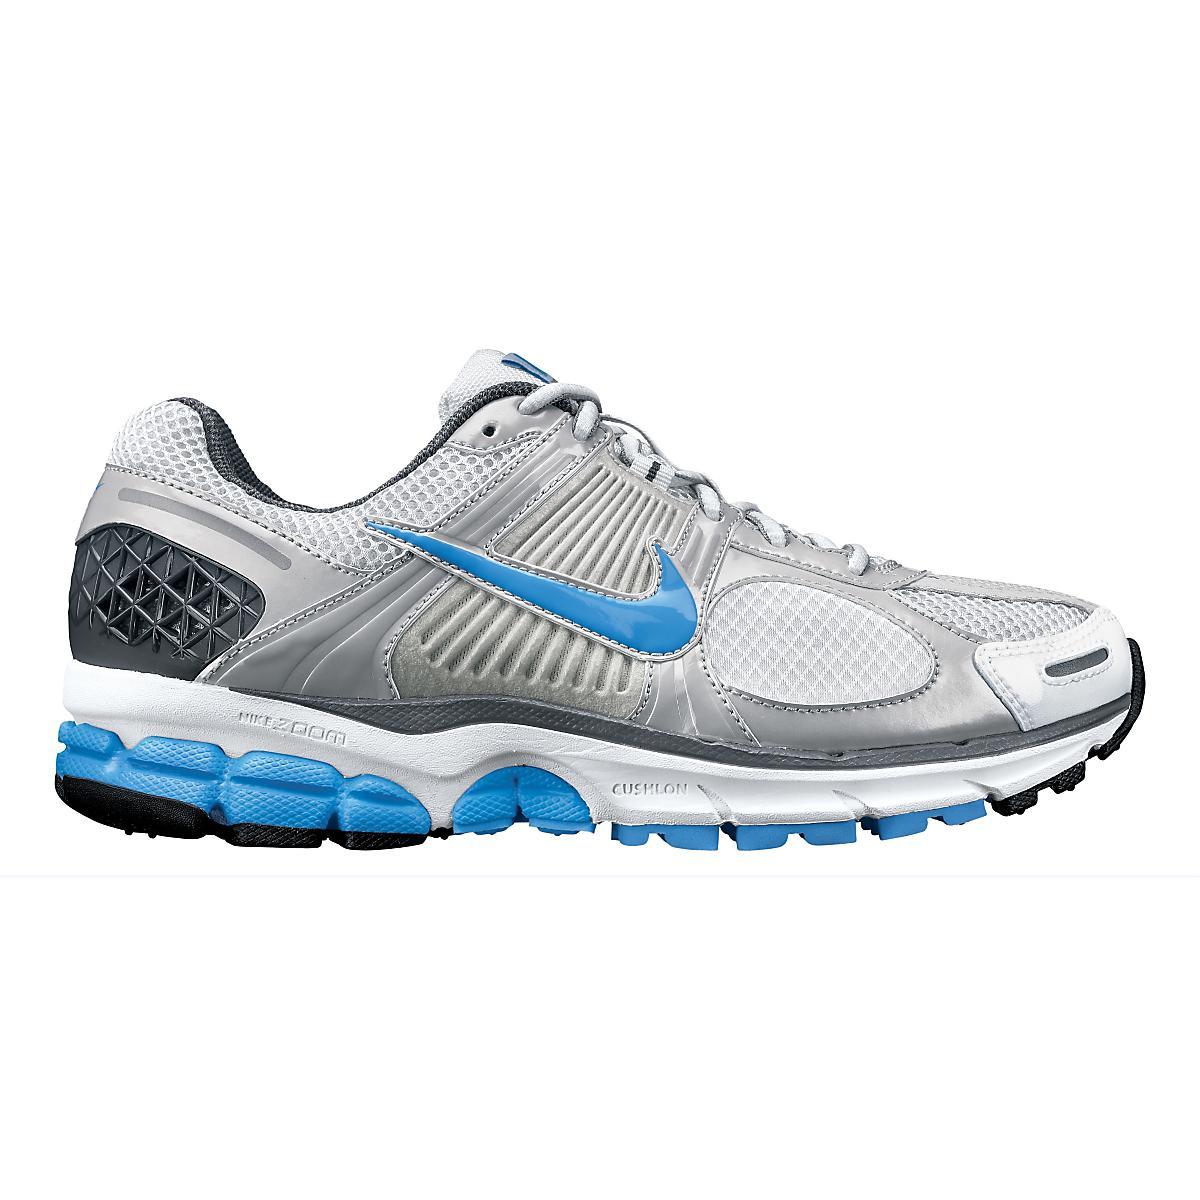 845f00115fee Womens Nike Zoom Vomero+ 5 Running Shoe at Road Runner Sports